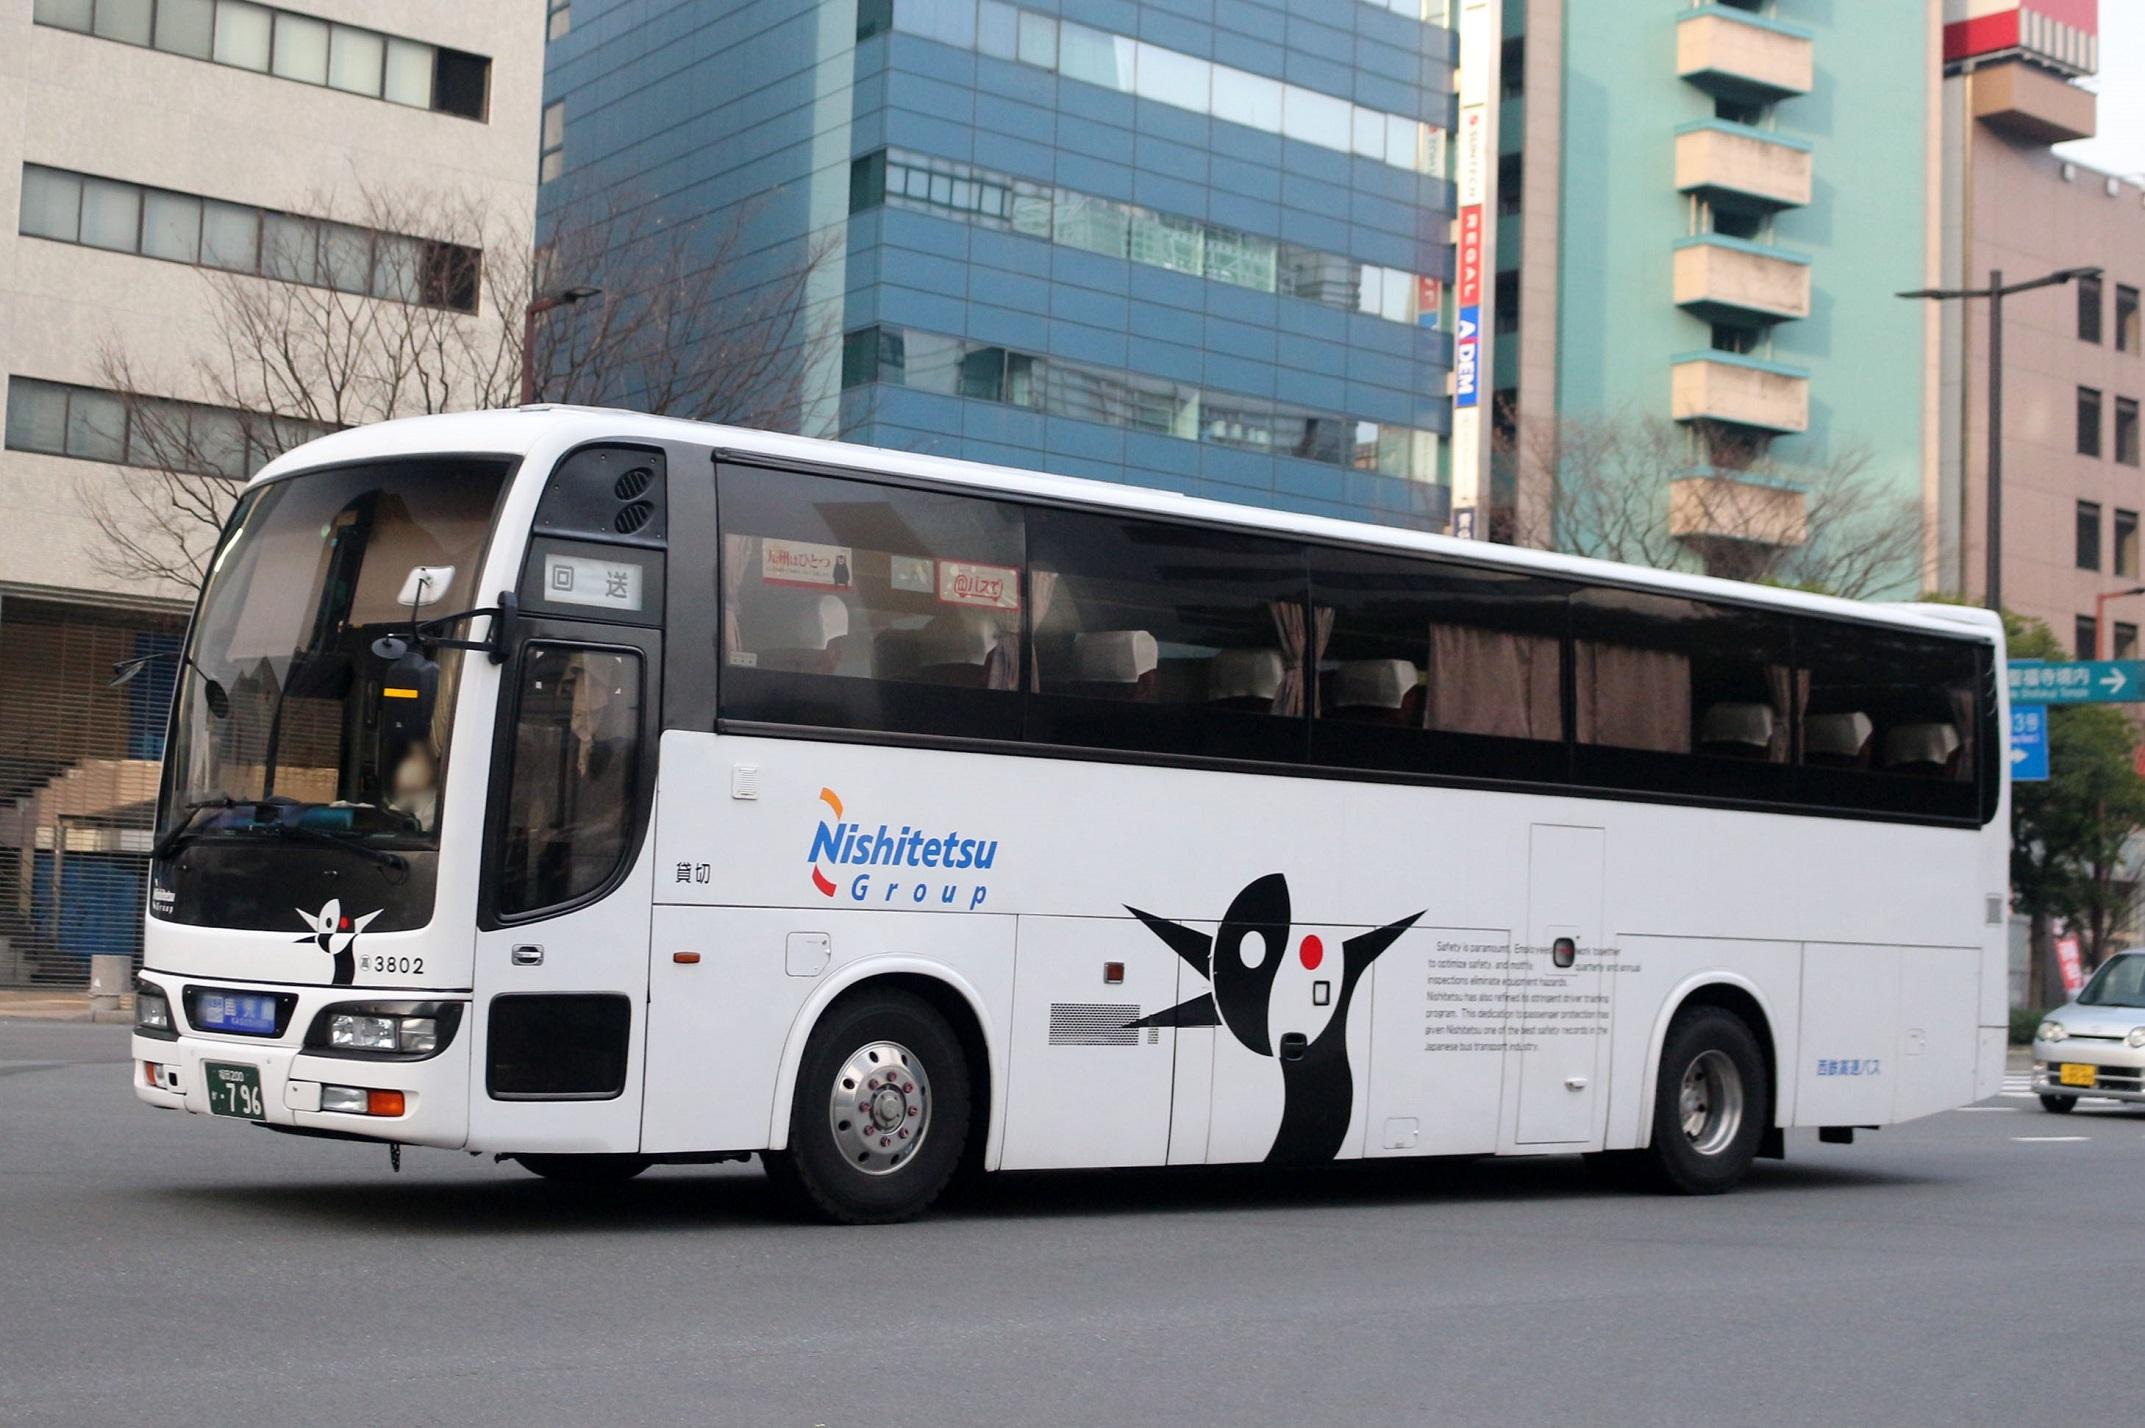 西鉄高速バス 3802